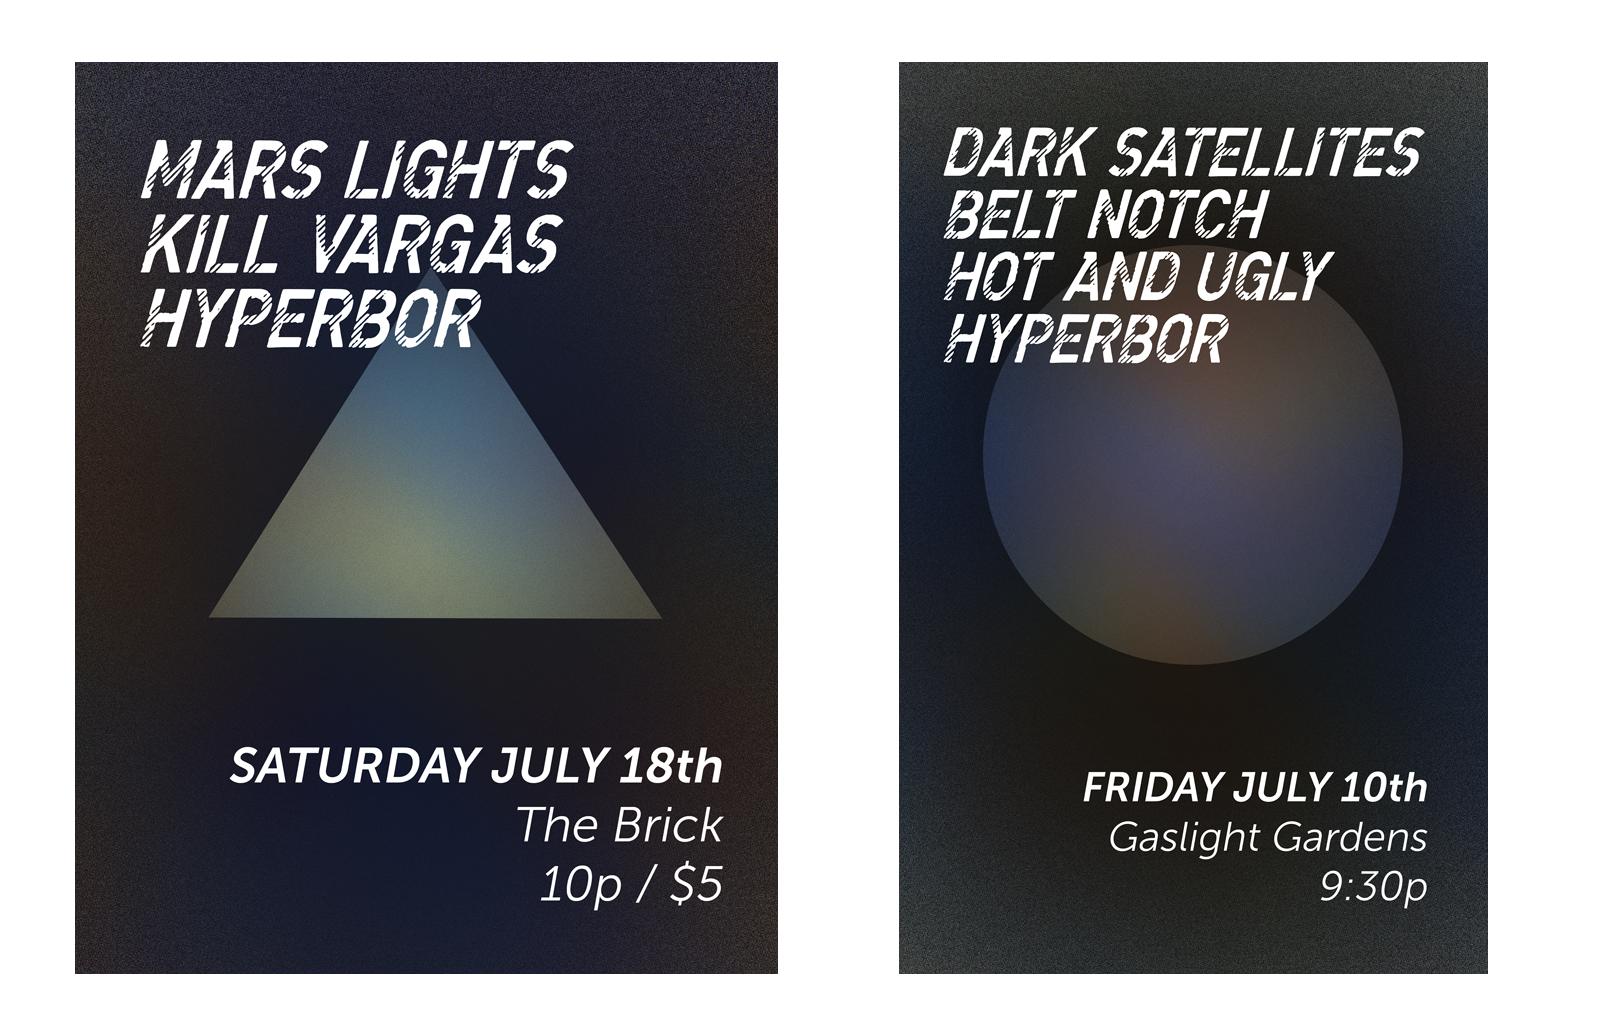 Mars Lights and Dark Sattelights